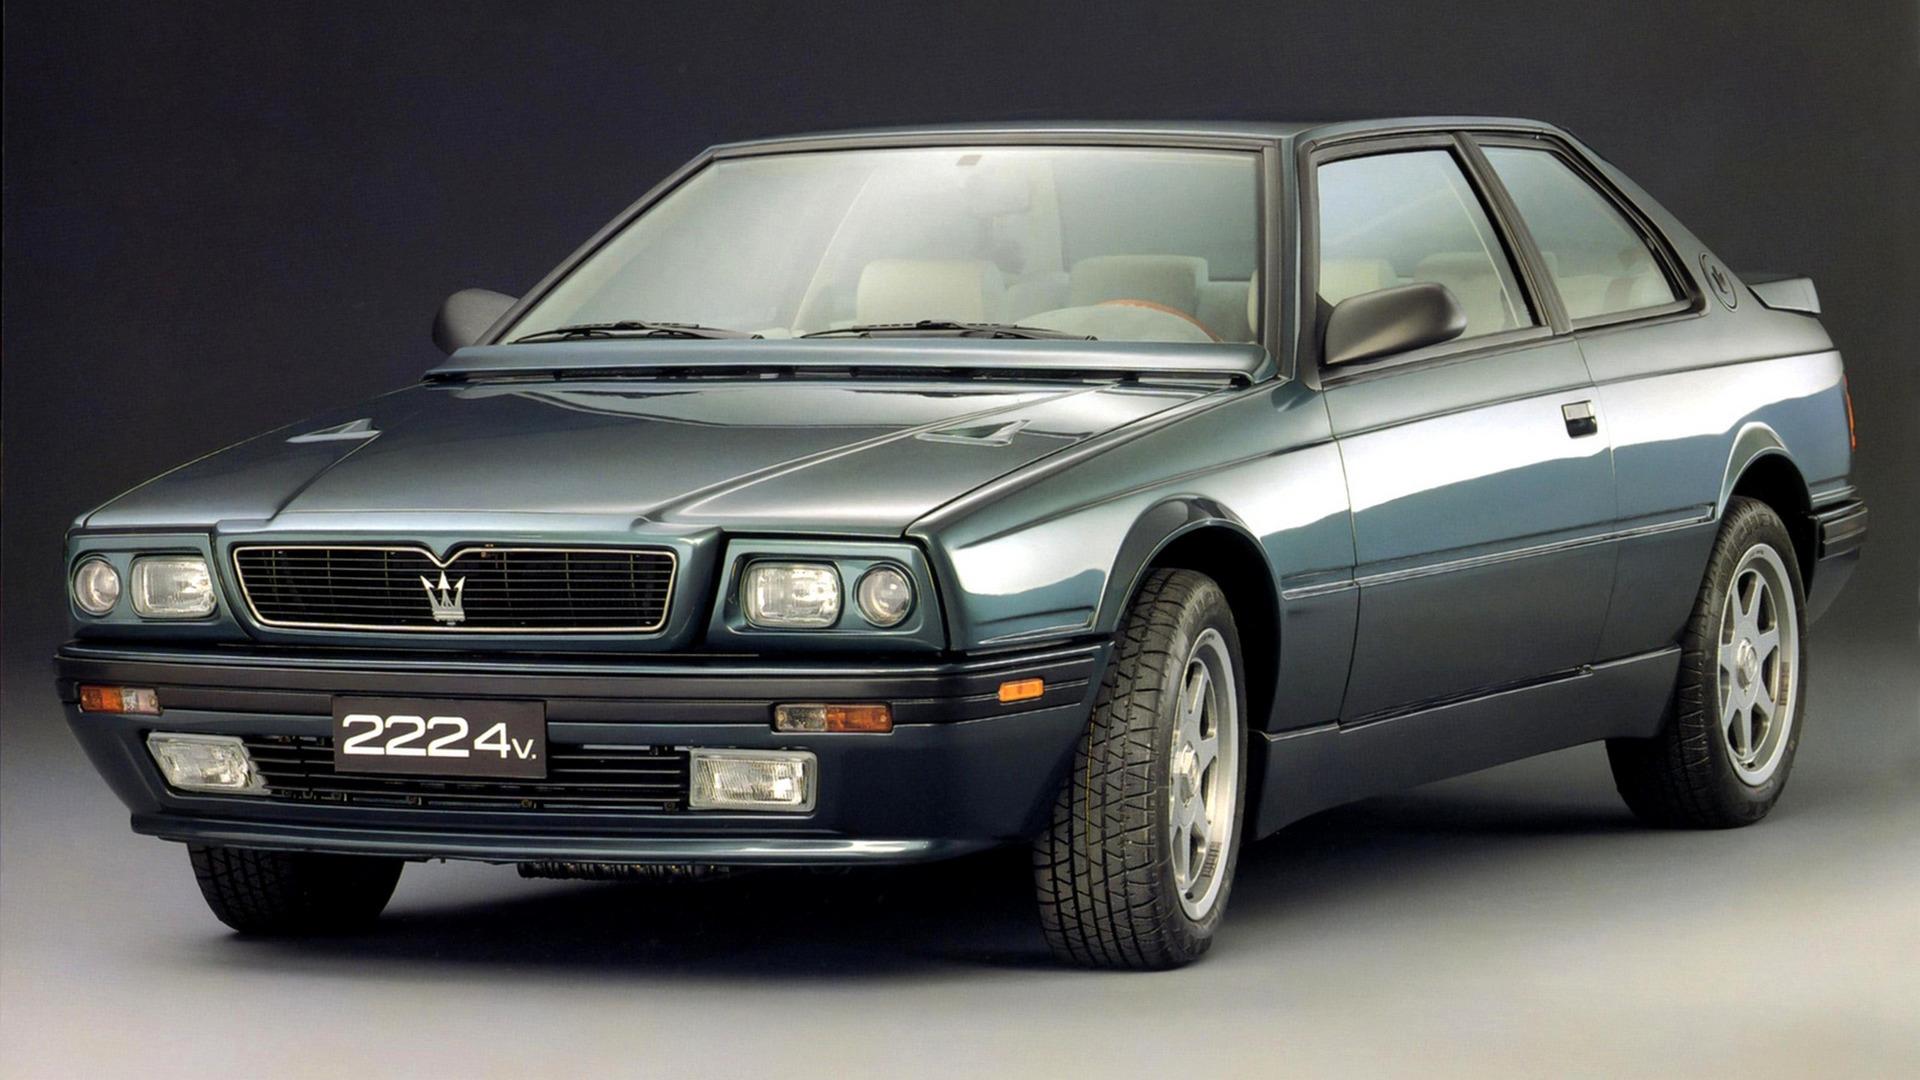 001 maserati-biturbo-coupe.jpg